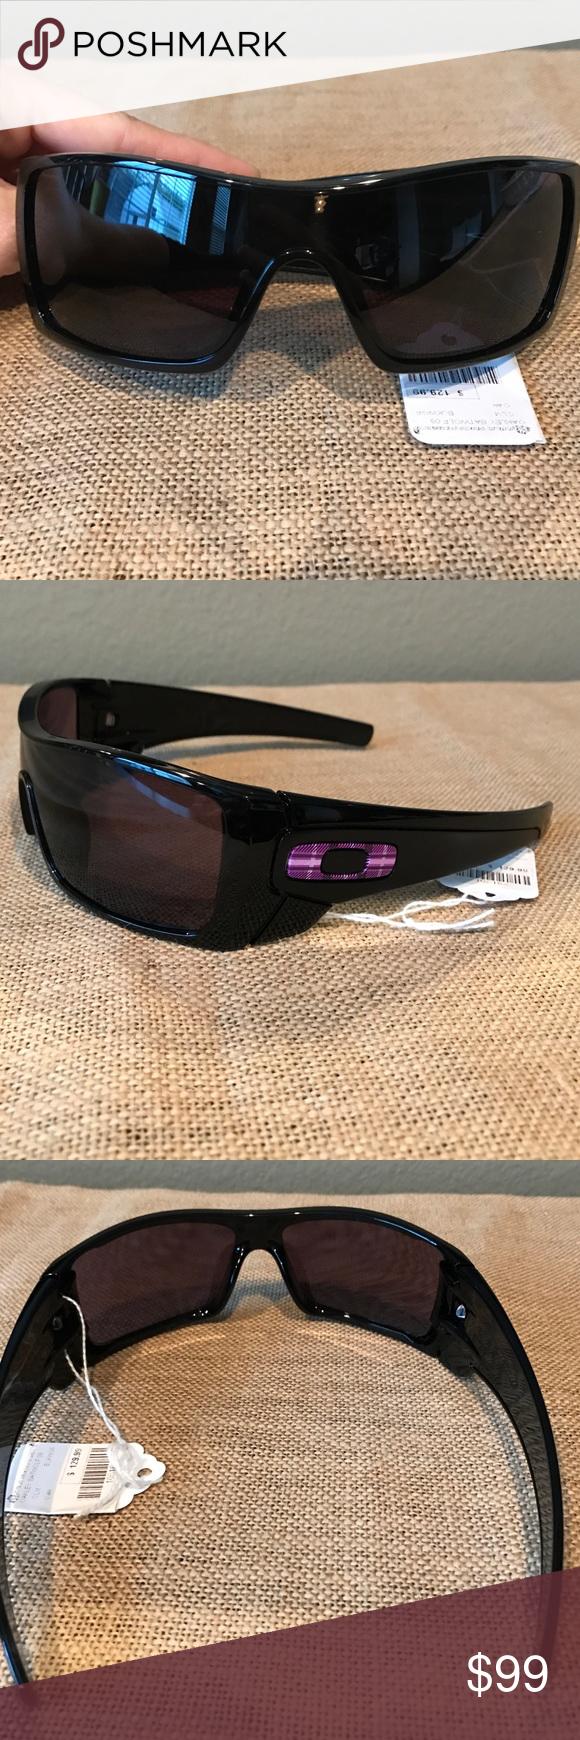 NWT Oakley sunglasses Boutique | Oakley sunglasses, Oakley and ...